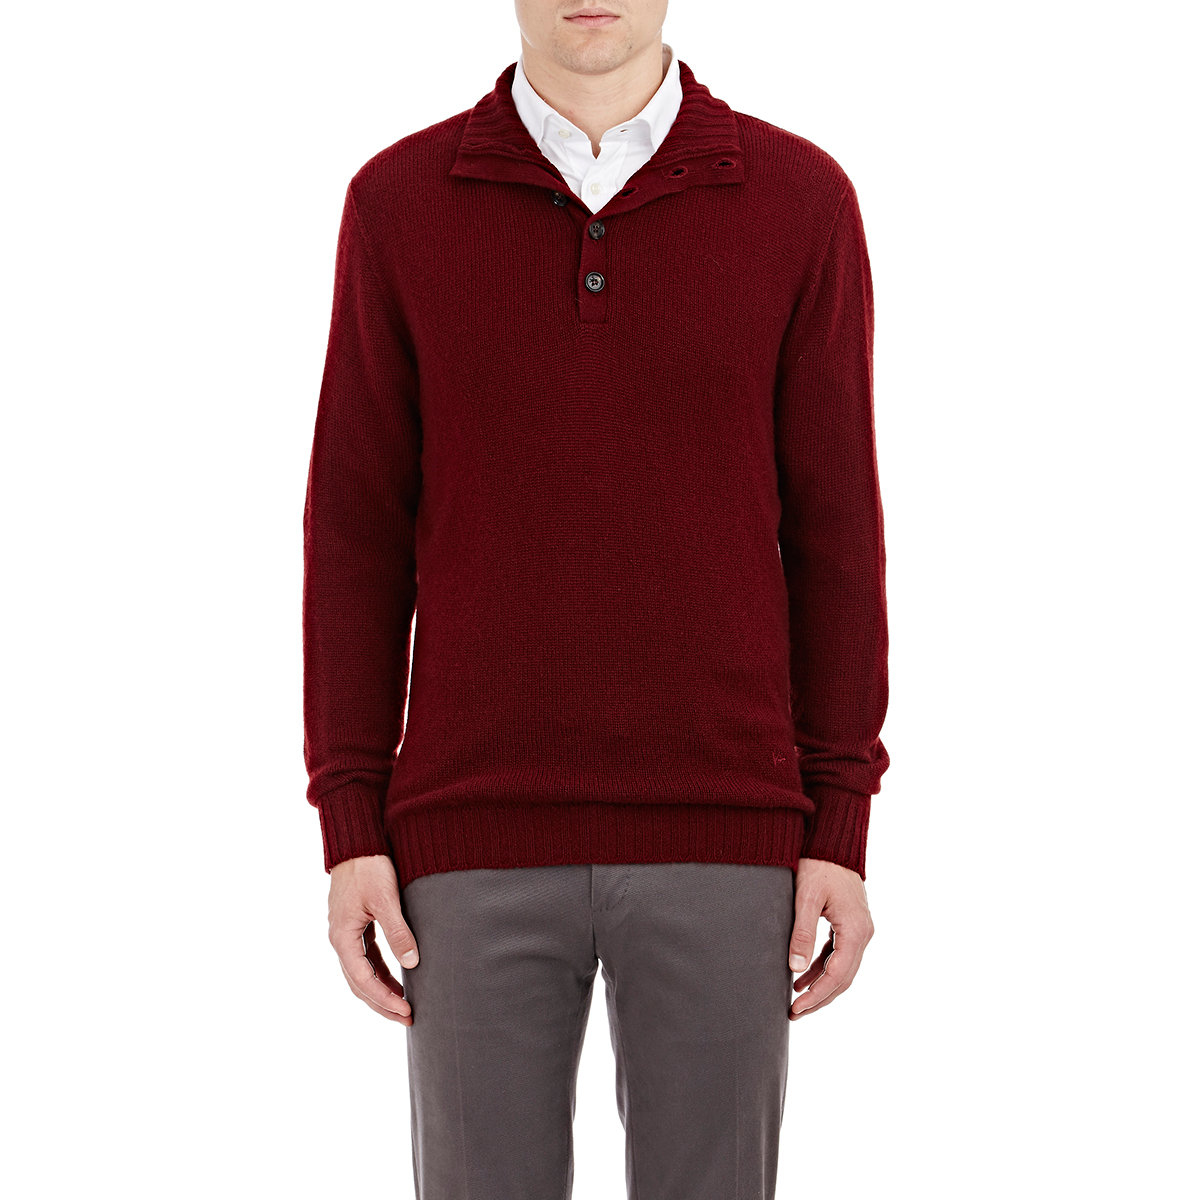 Man Red Cashmere Turtleneck Sweater